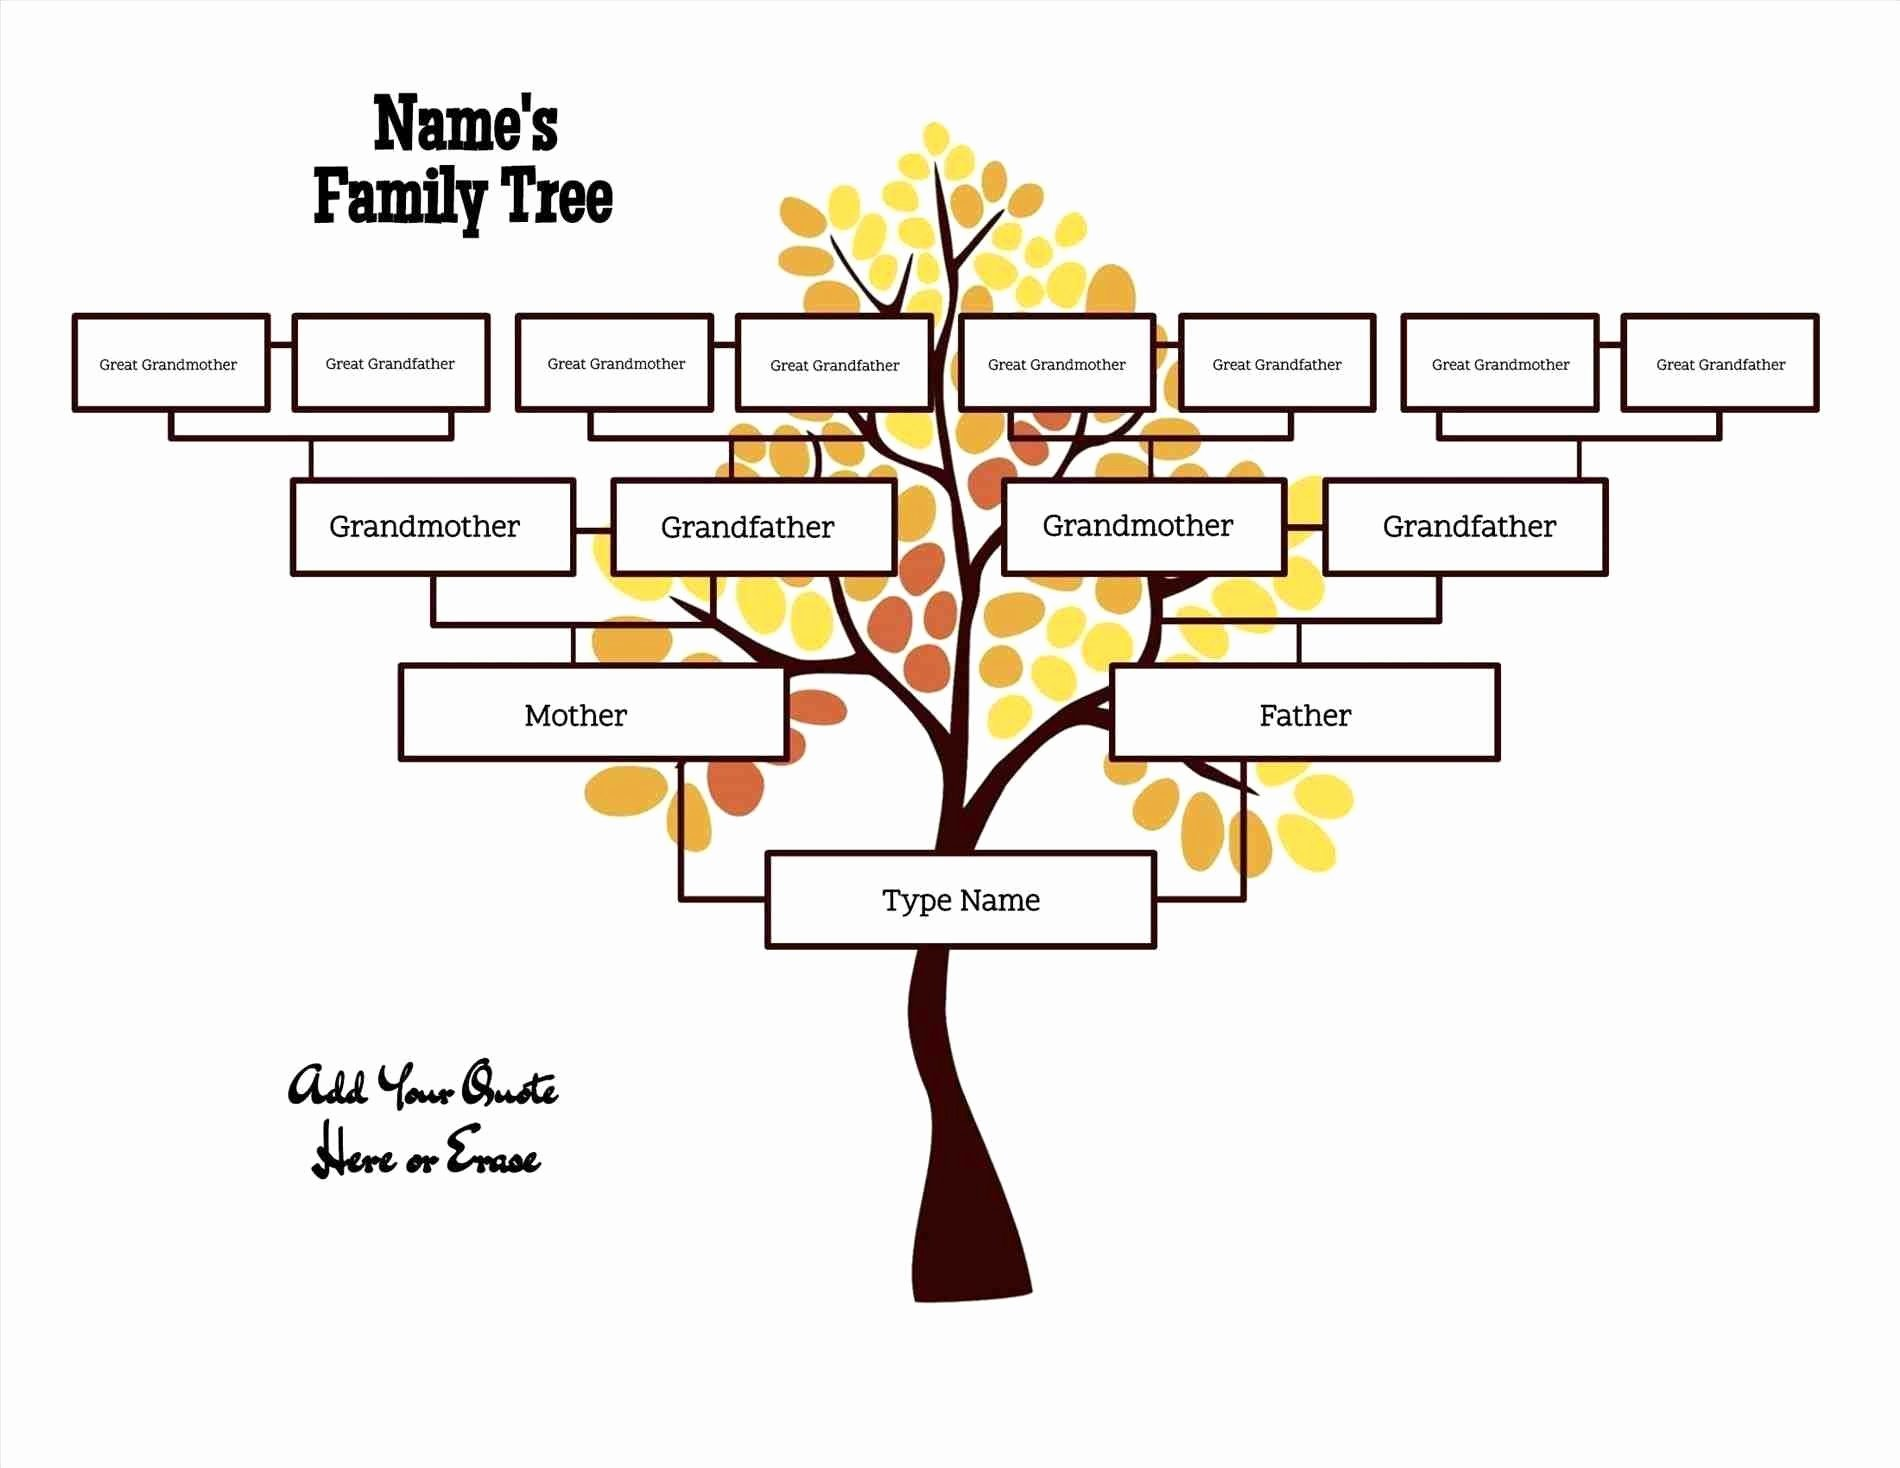 Editable Family Tree Template Inspirational Free Editable Family Tree Template Daily Roabox